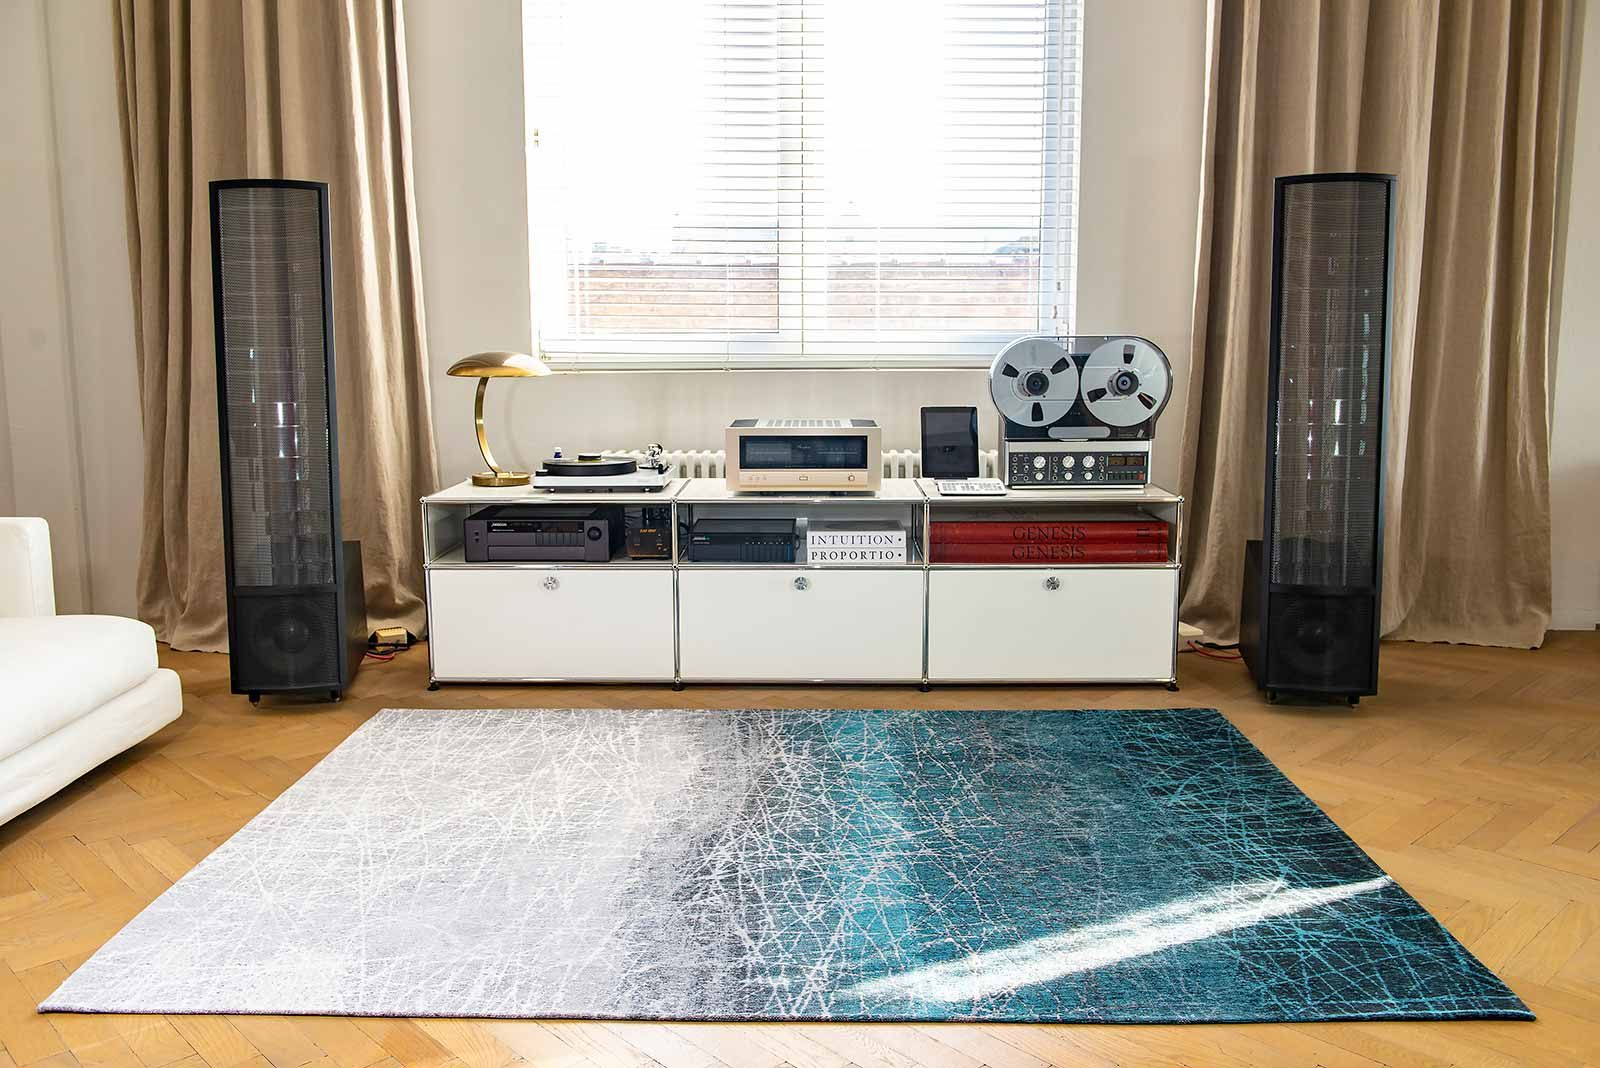 alfombras Louis De Poortere LX 8877 Mad Men Fahrenheit Polar Vortex interior 2